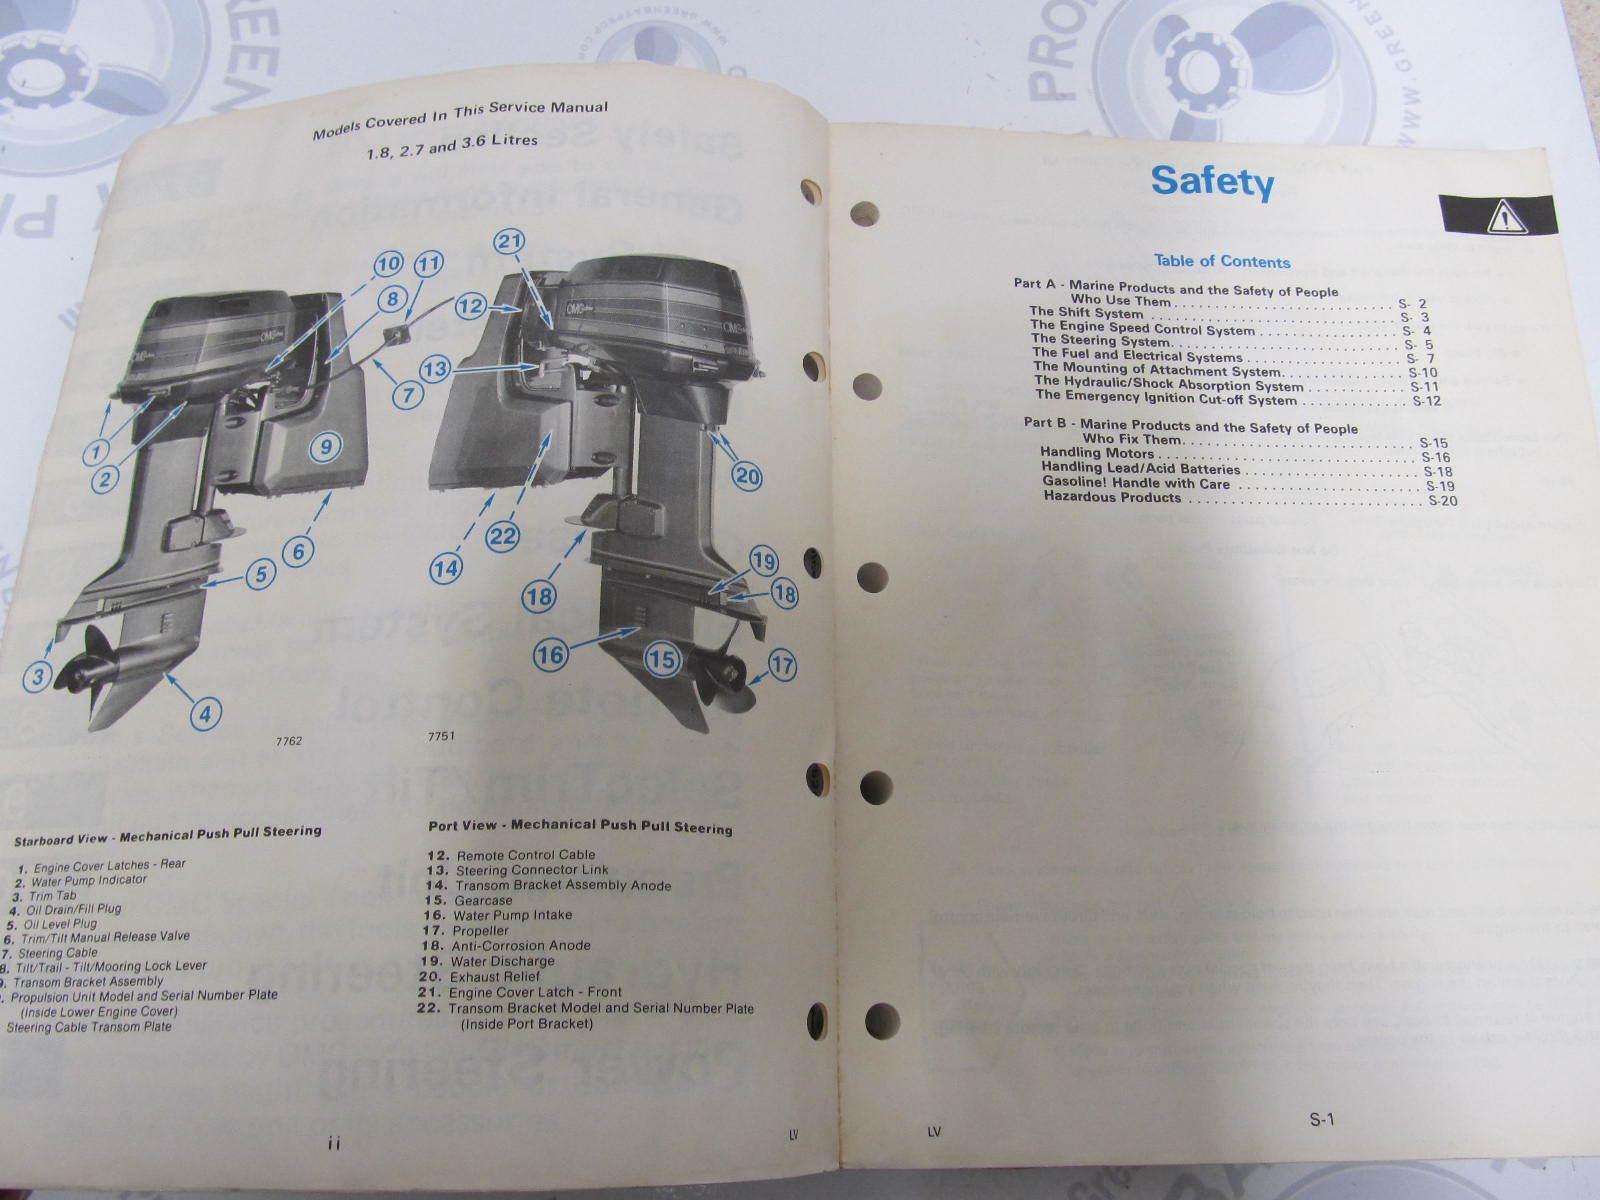 hight resolution of  507624 1987 omc sea drive marine engine service manual 1 8 2 7 3 6l